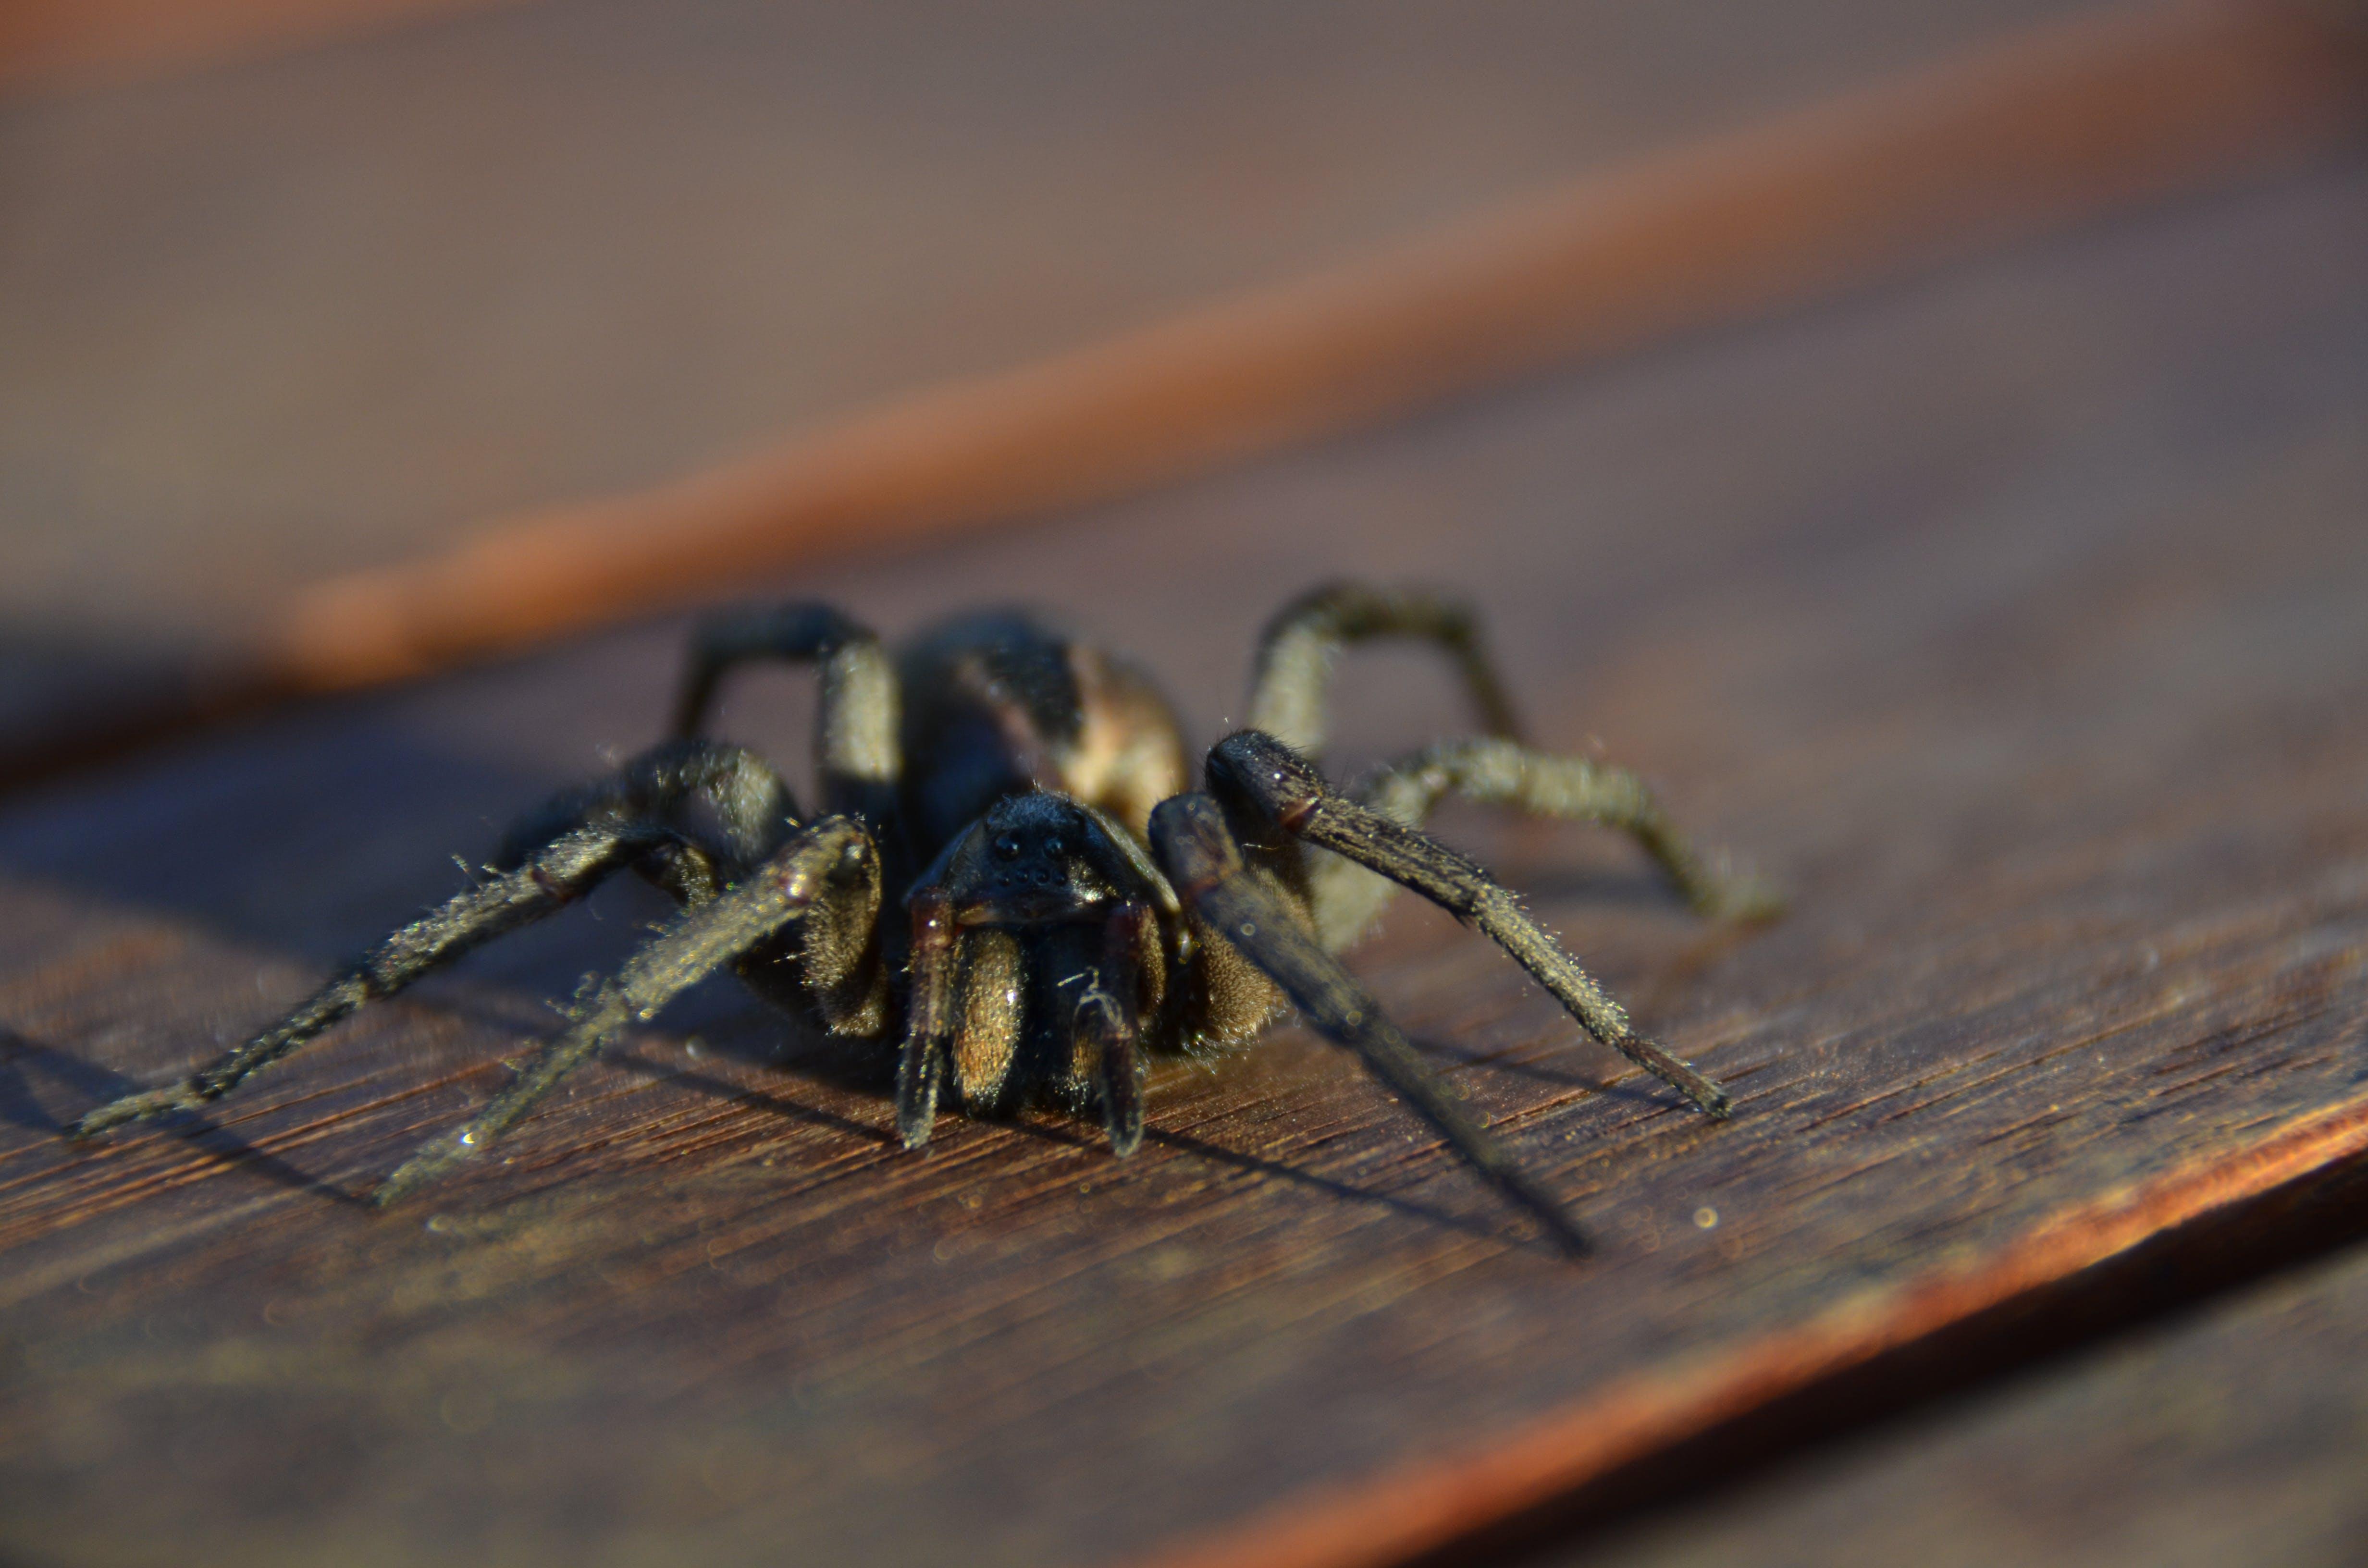 Free stock photo of large australian spider